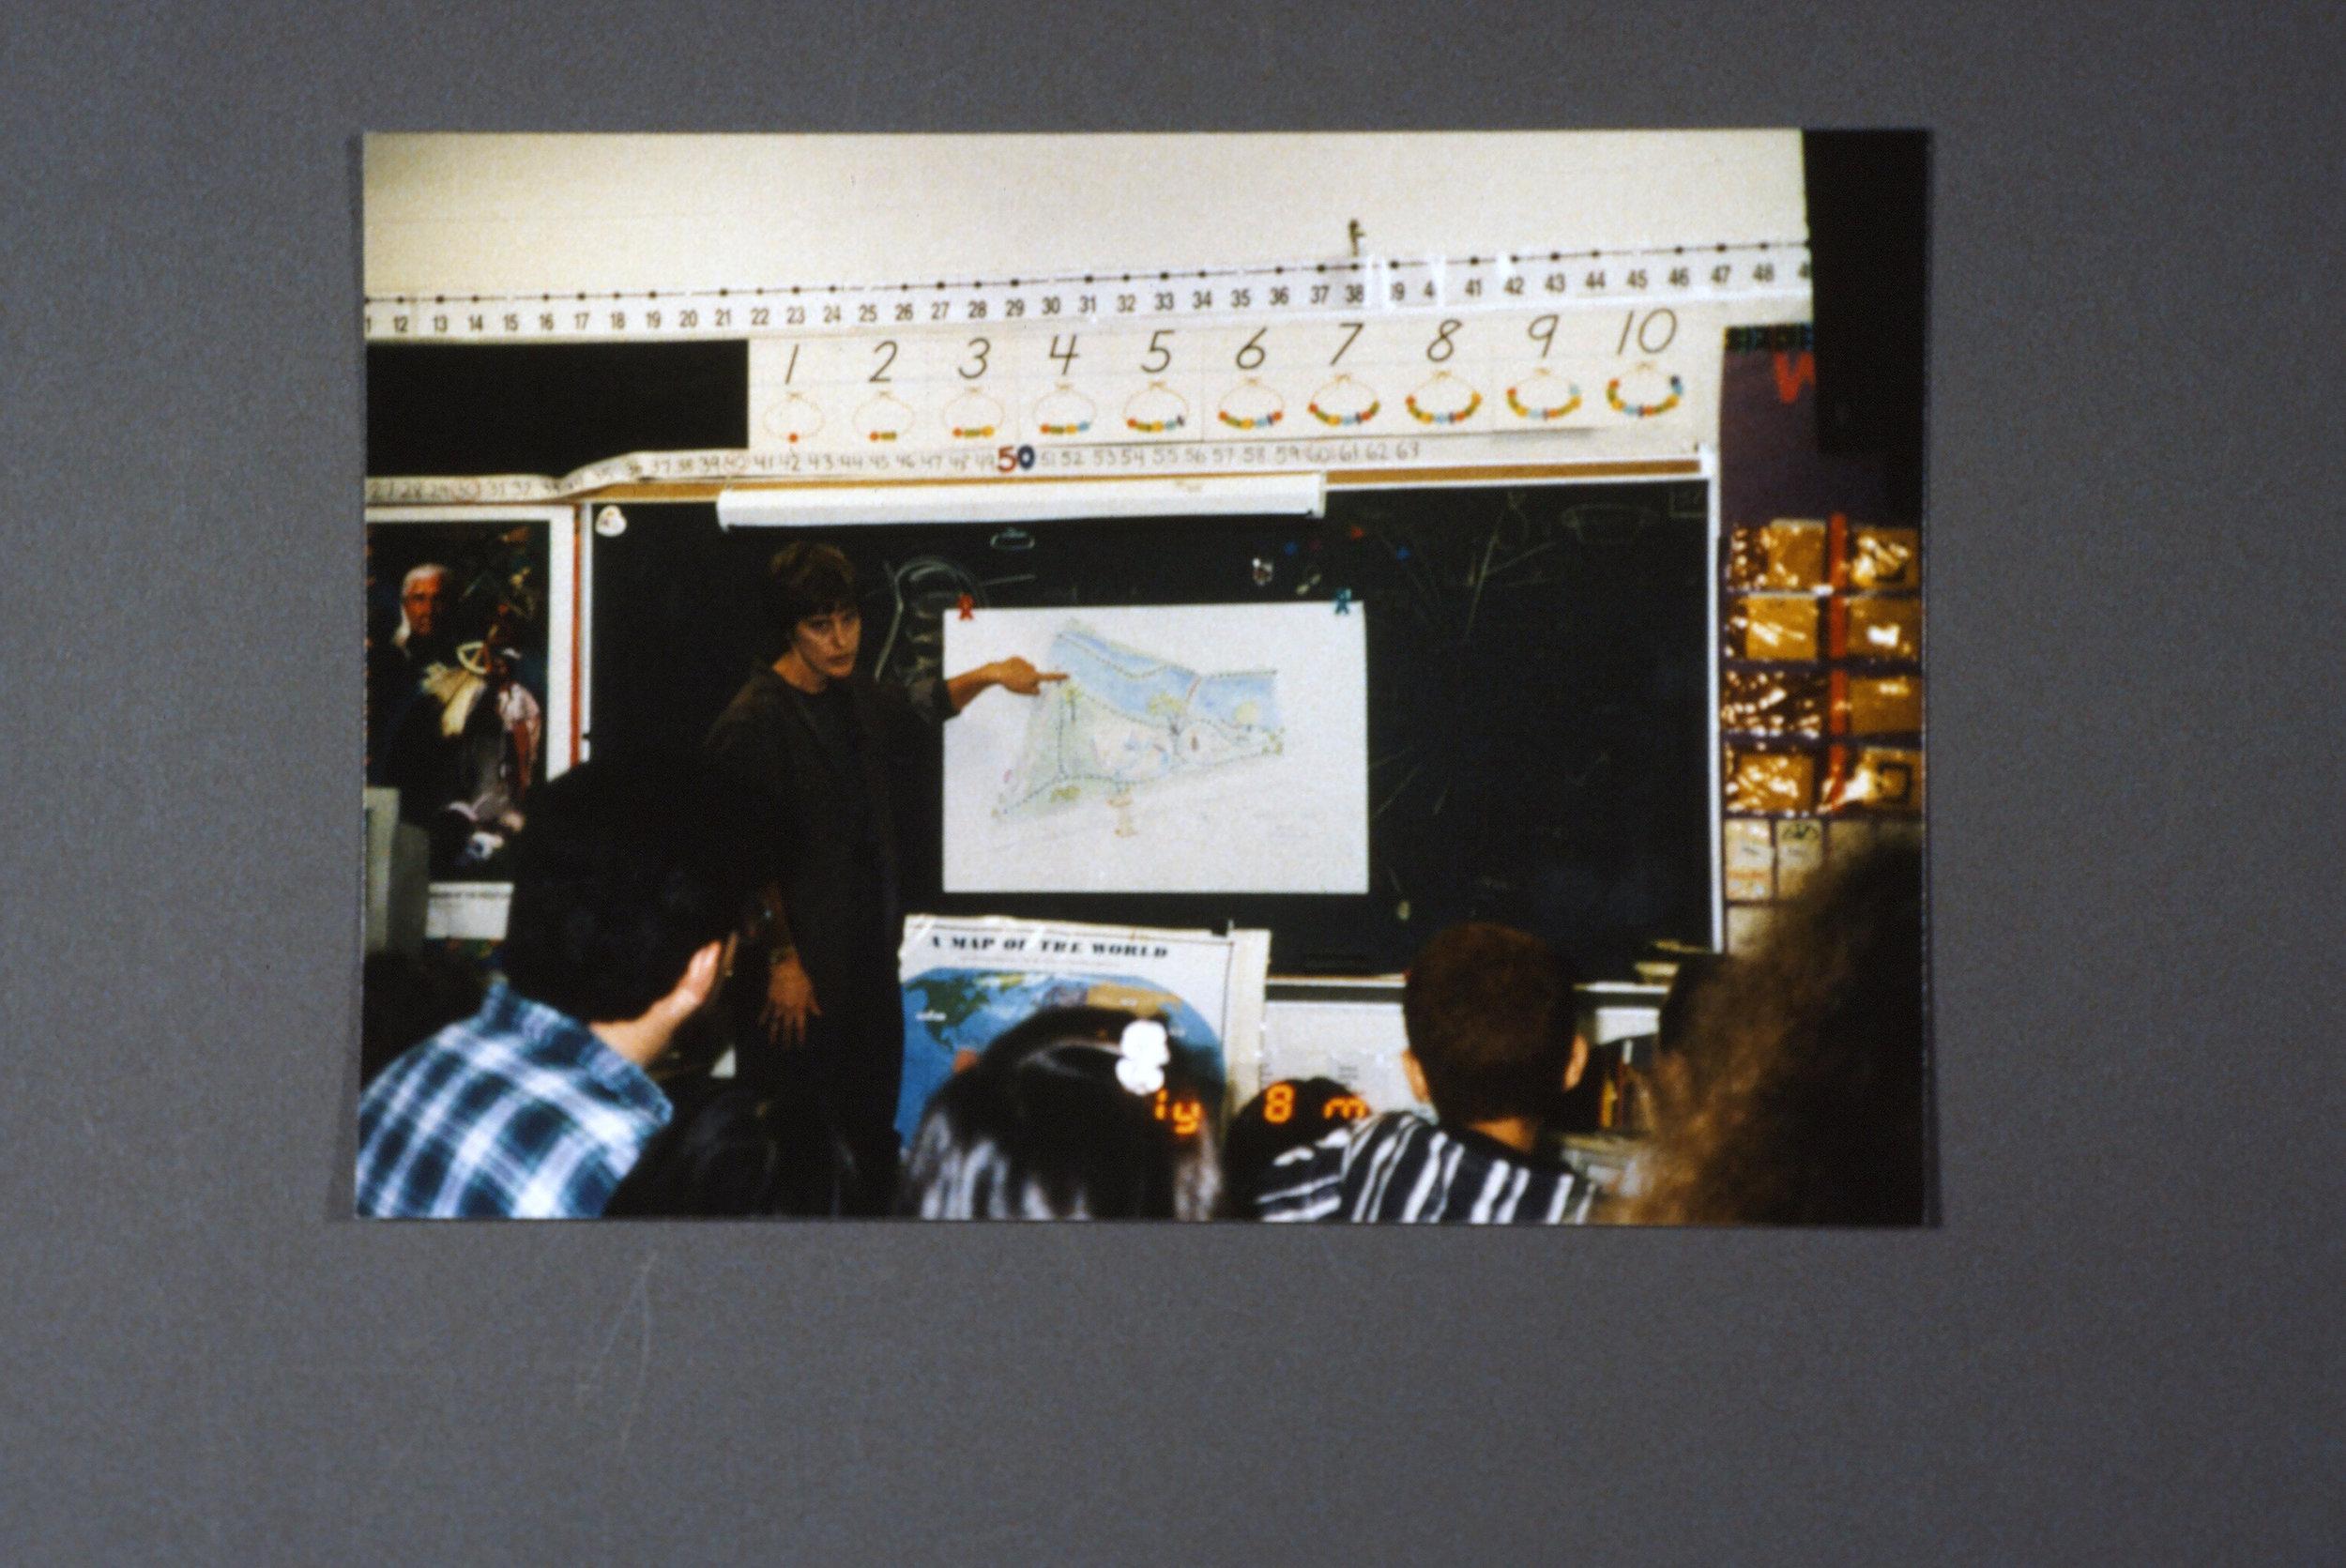 Broadway Park lanscape student presentation to elementary students copy.jpeg